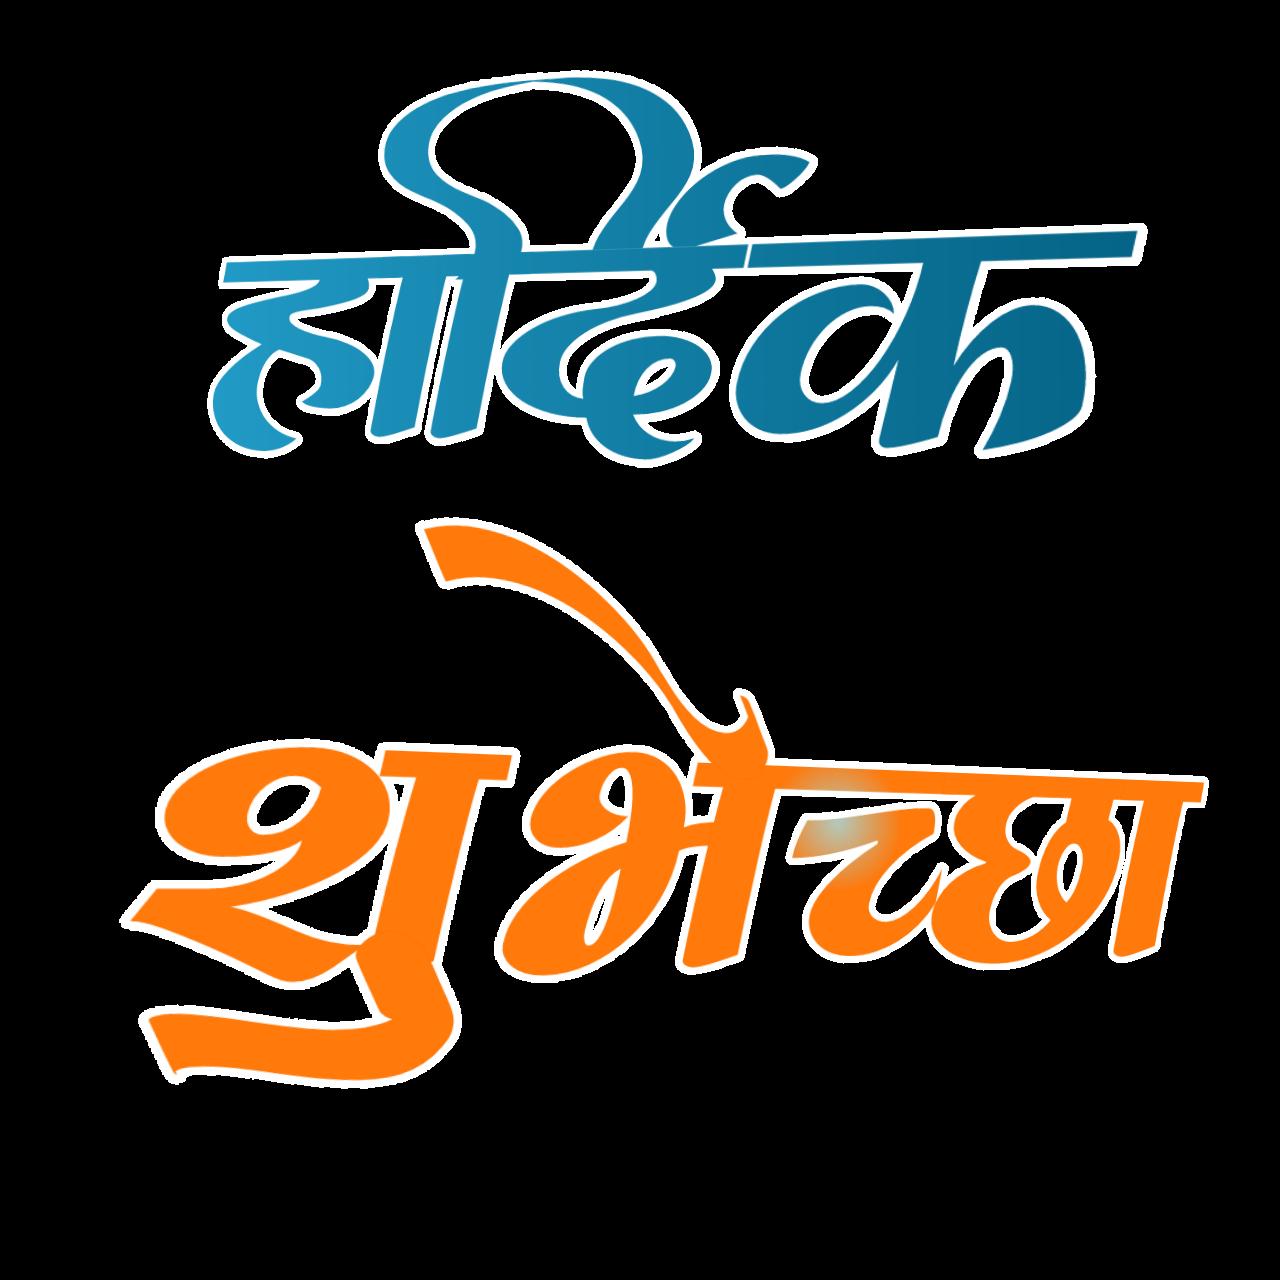 Vadhdivsachya hardik shubhechha in marathi png - Thepix.info Vadhdivas Chya Hardik Shubhechha